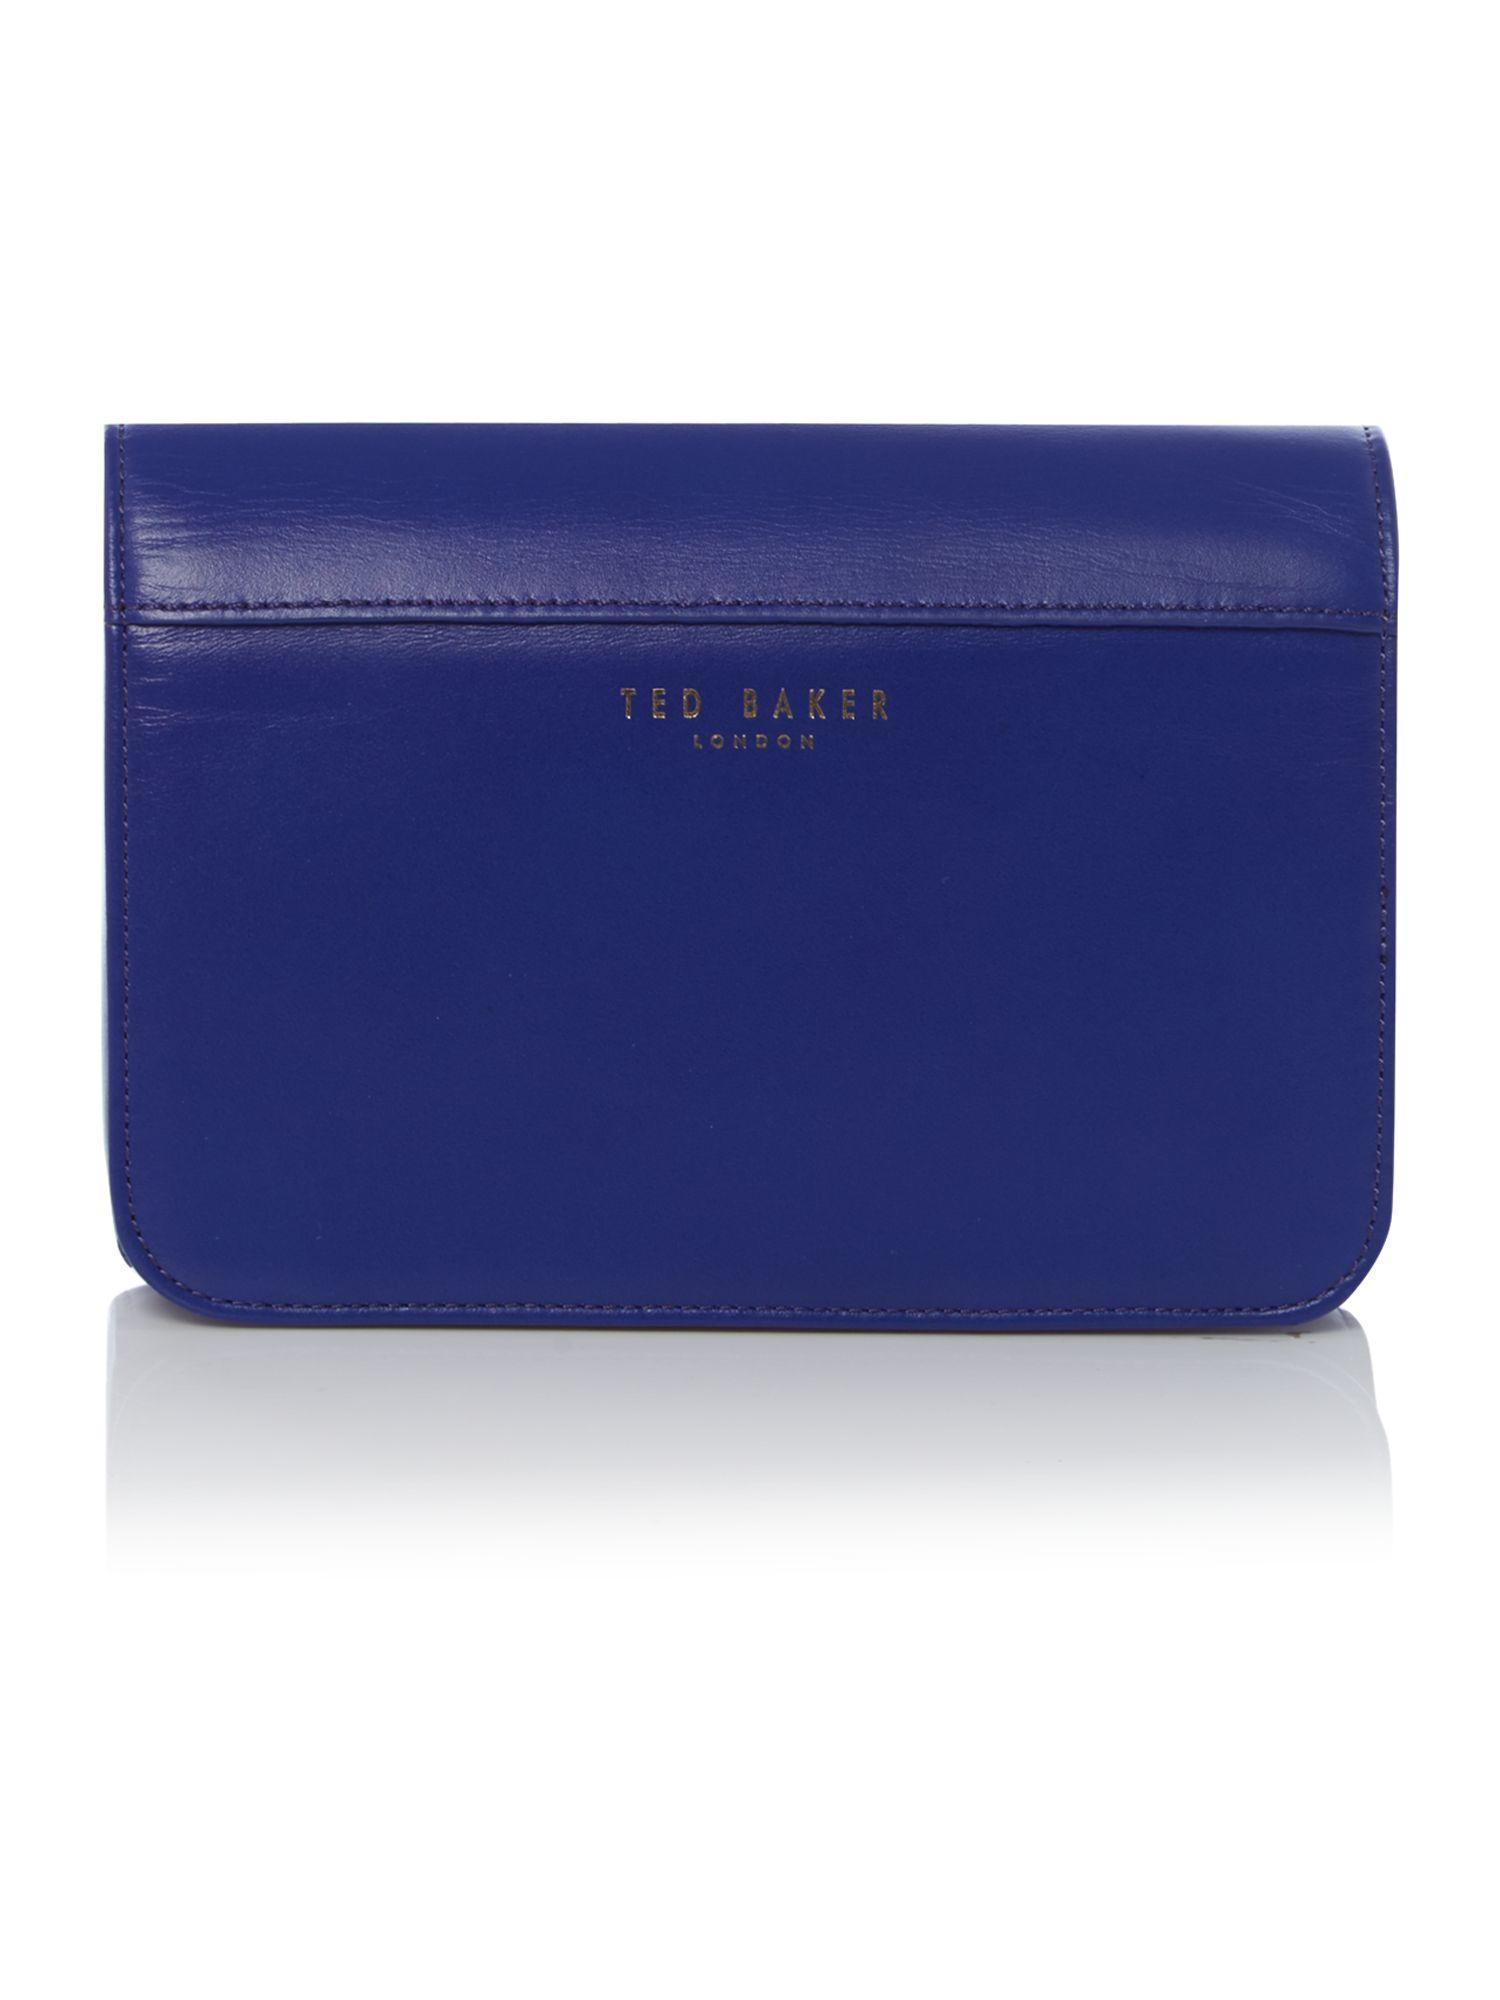 Ted Baker Khloe Blue Loop Bow Cross Body Bag